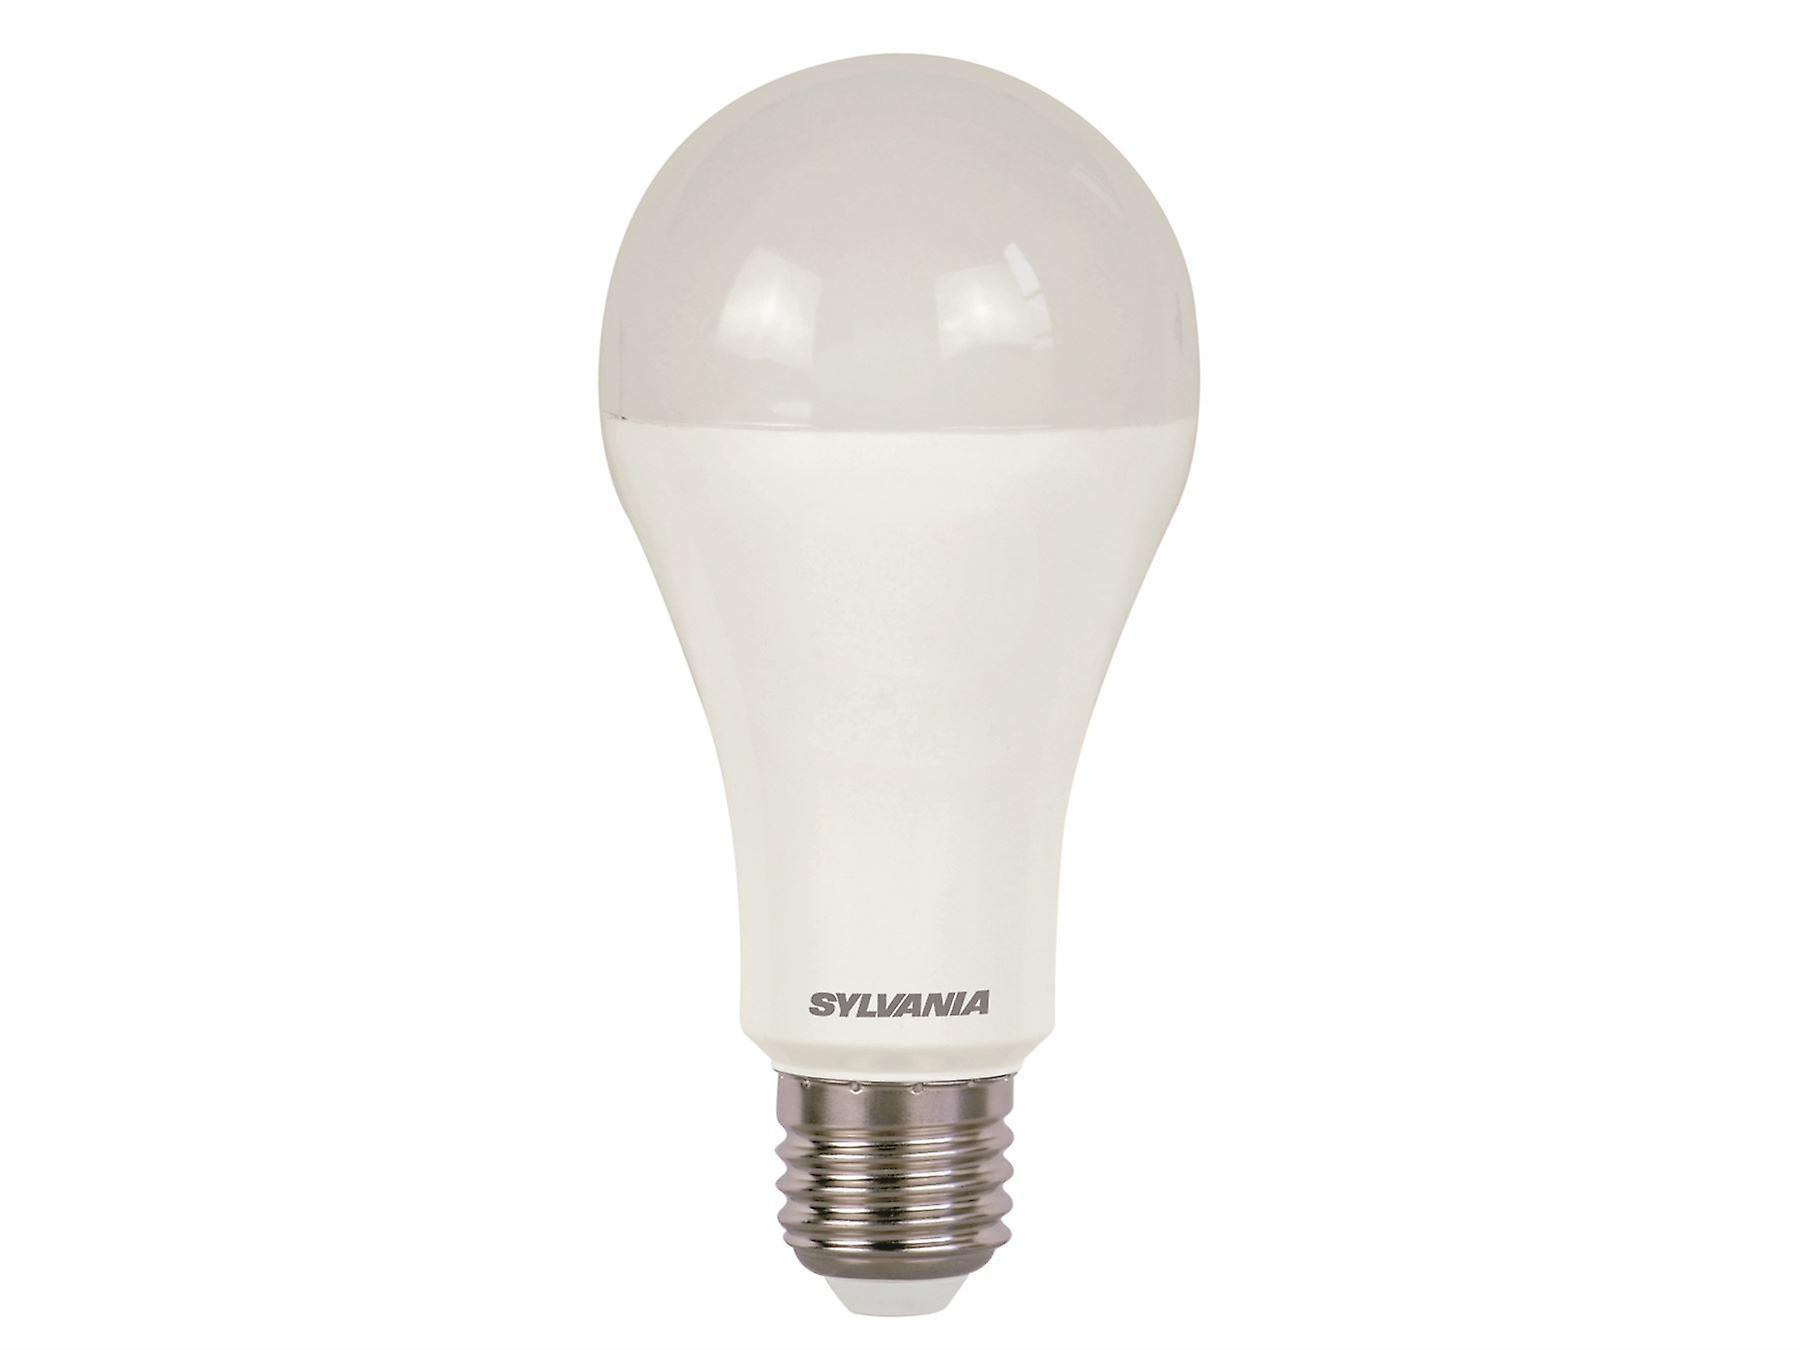 1 x Sylvania ToLEDo A66 Dimmable E27 V4 15W Homelight LED 1521lm [Energy Class A+]